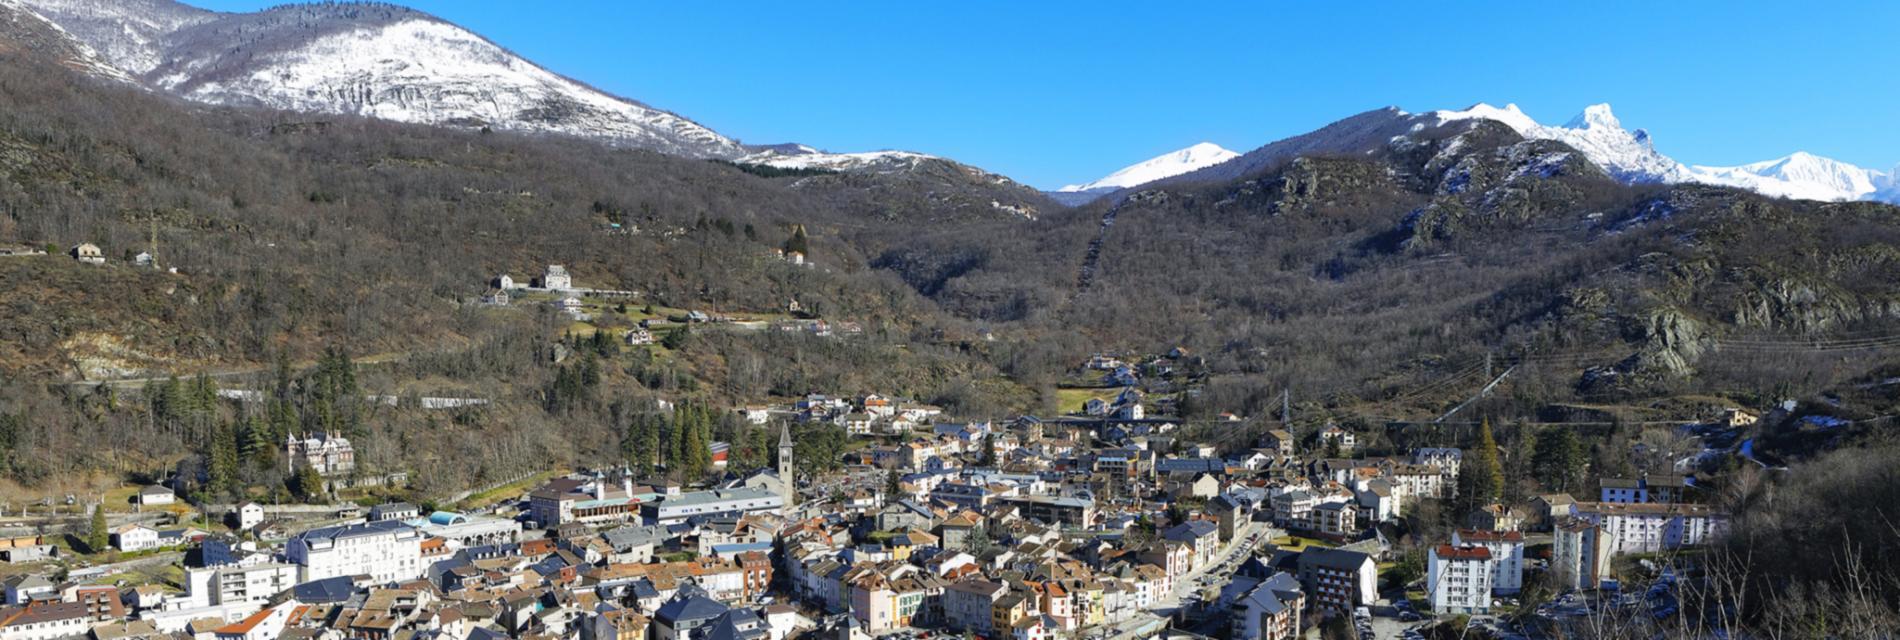 Slide Les Grand Ax - village